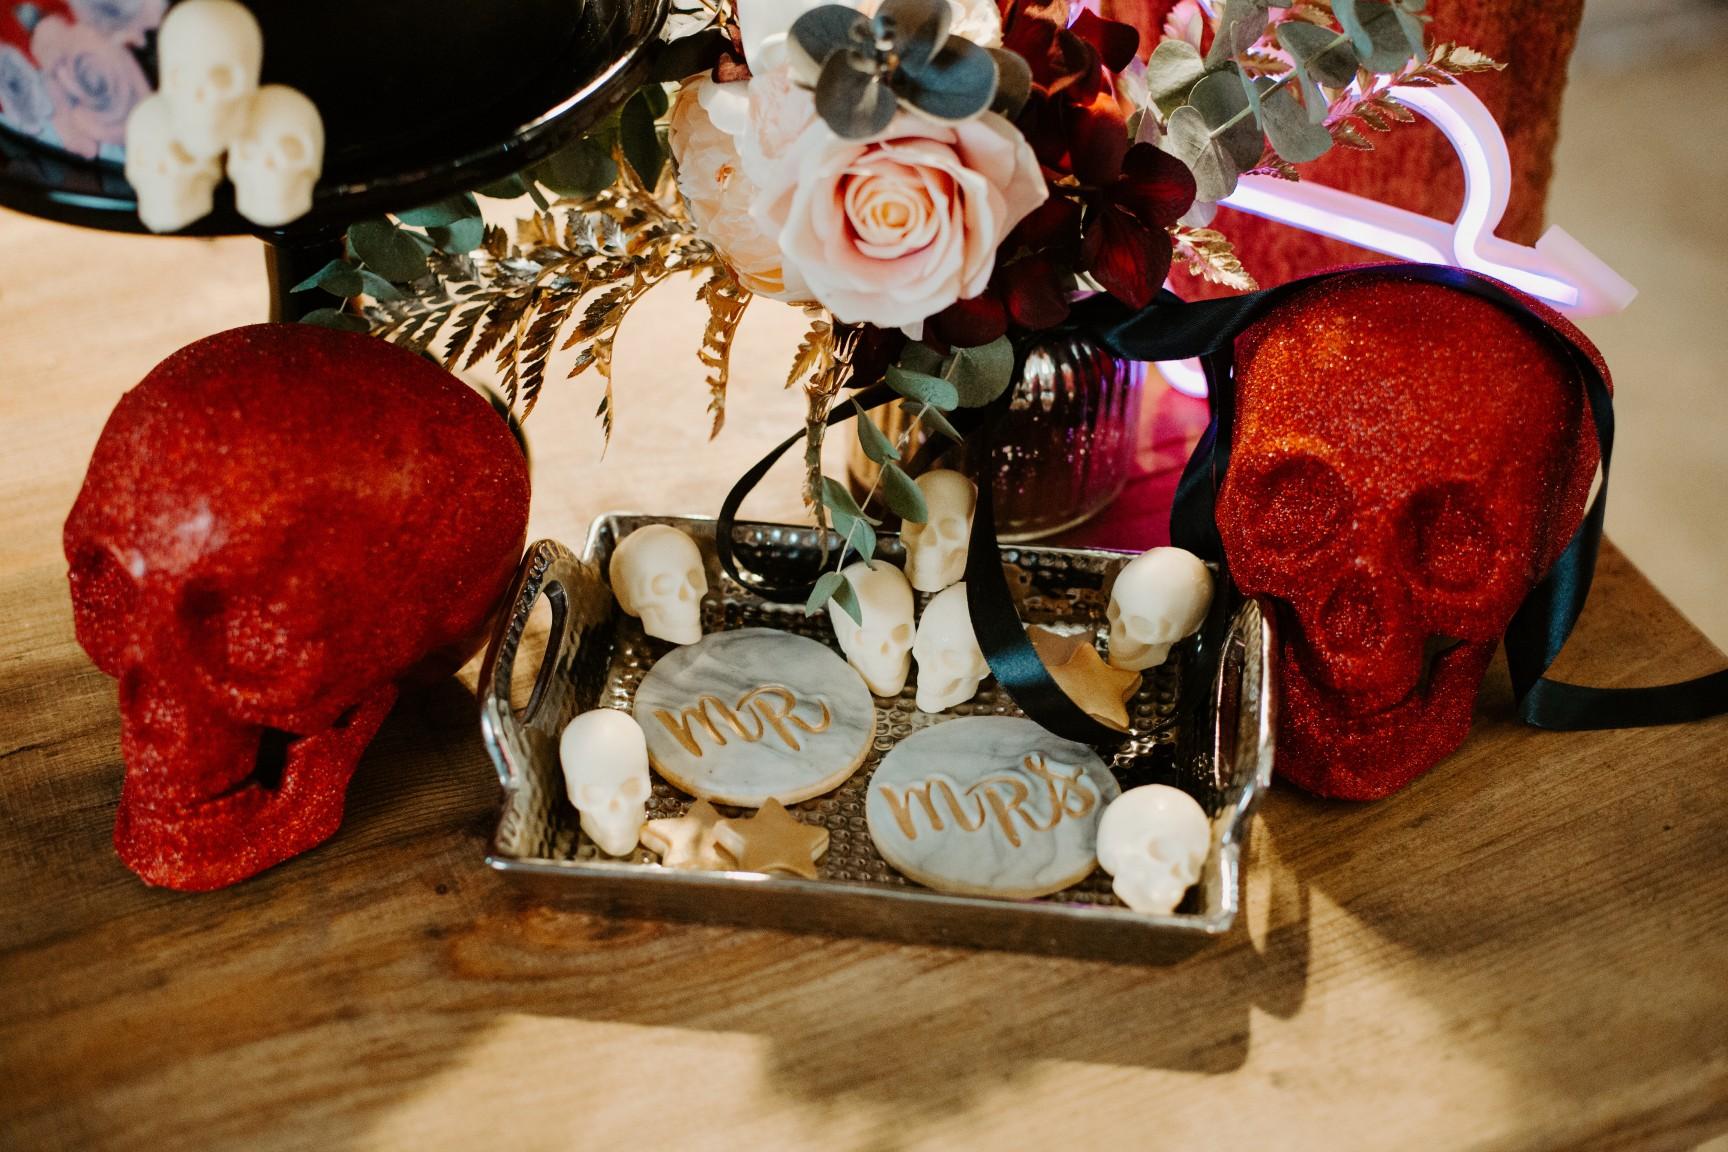 rock and roll wedding - edgy wedding inspiration - mr and mrs cookies - skull wedding decor - edgy wedding decor